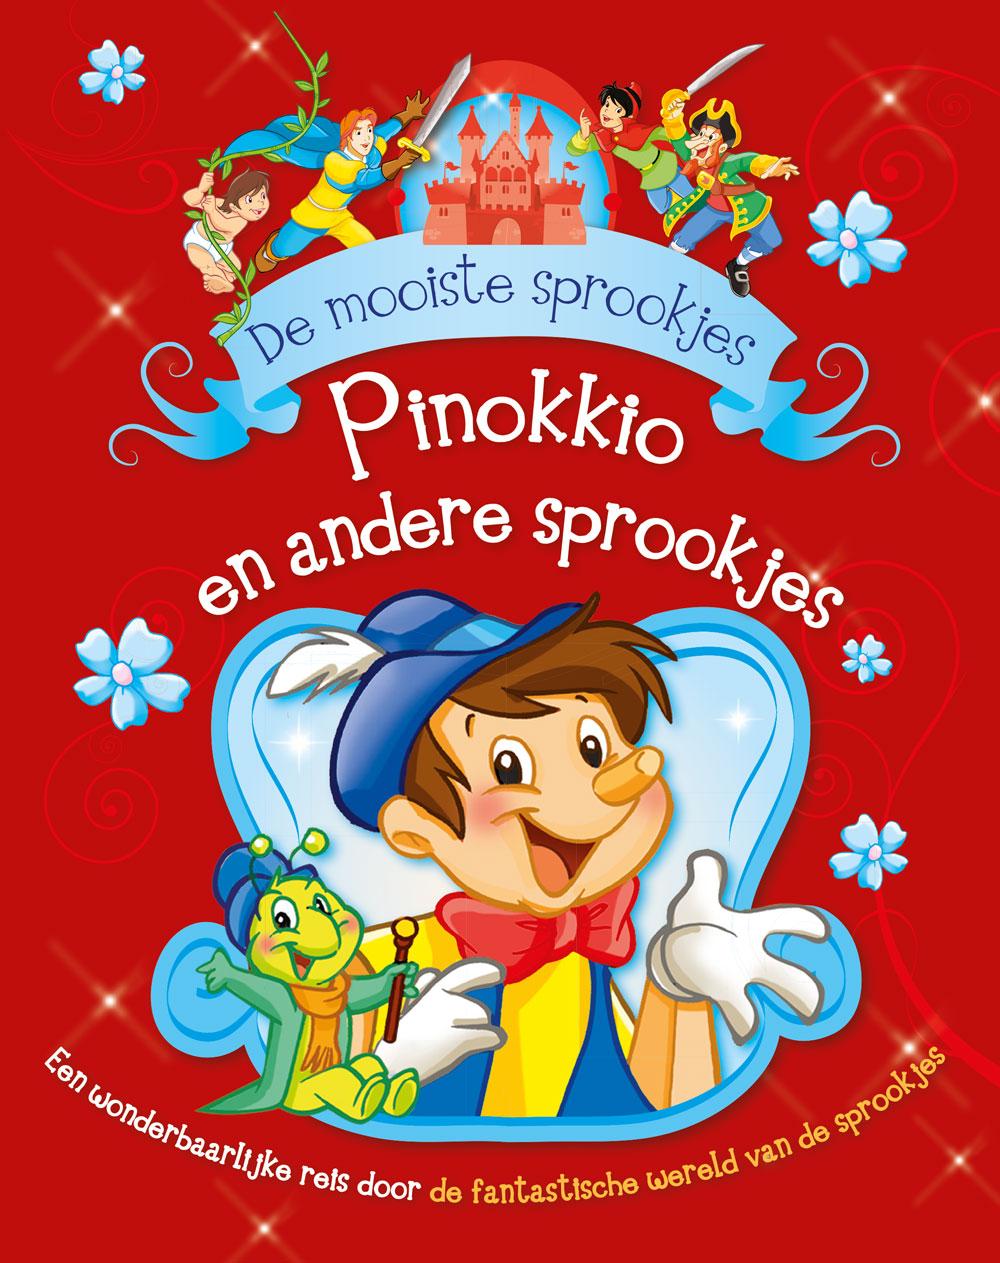 Mooiste sprookjes Pinokkio e.a.